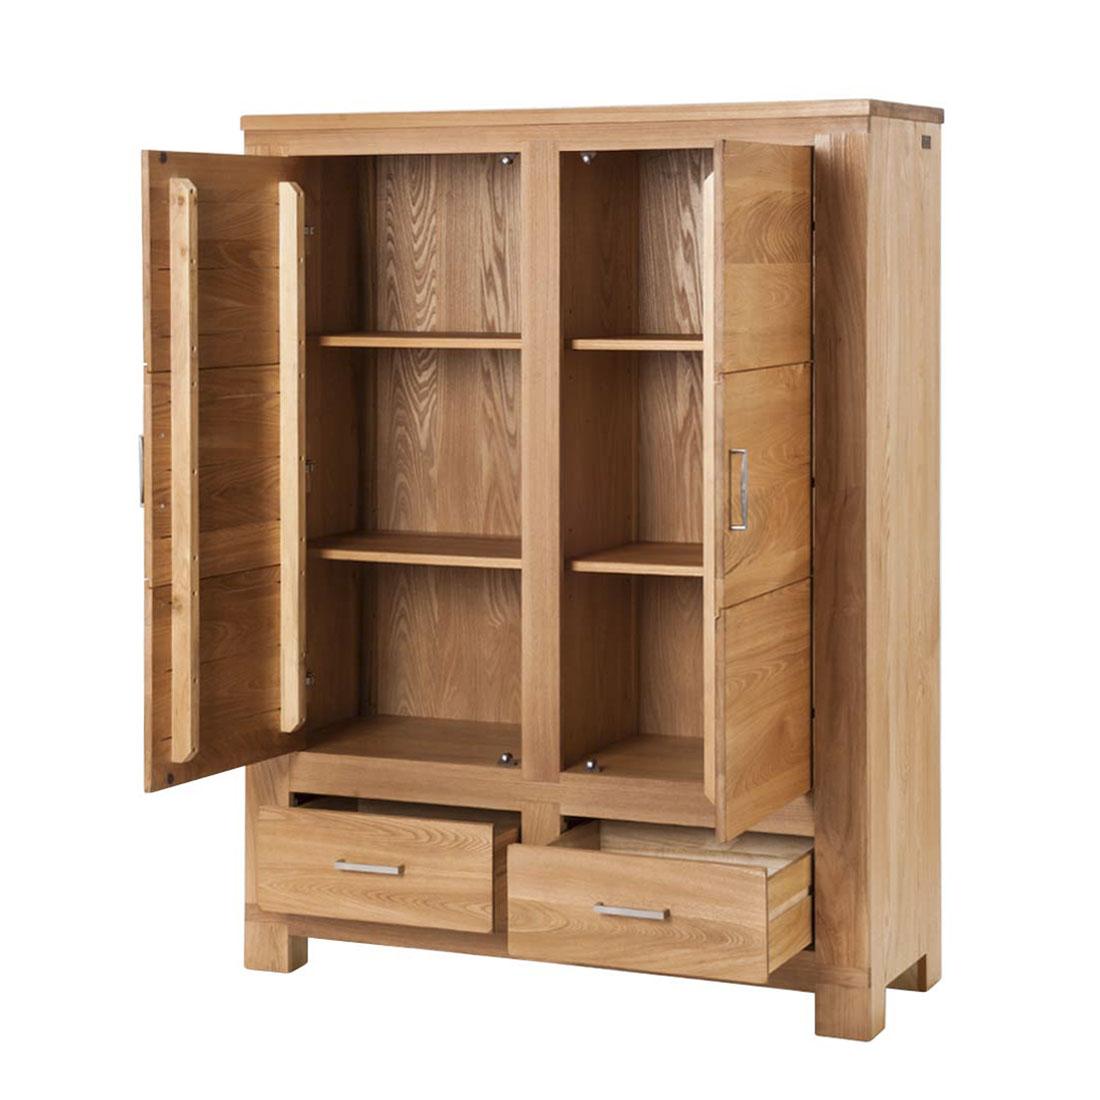 esszimmerschrank wandschrank ulme furniert geschirrschrank. Black Bedroom Furniture Sets. Home Design Ideas